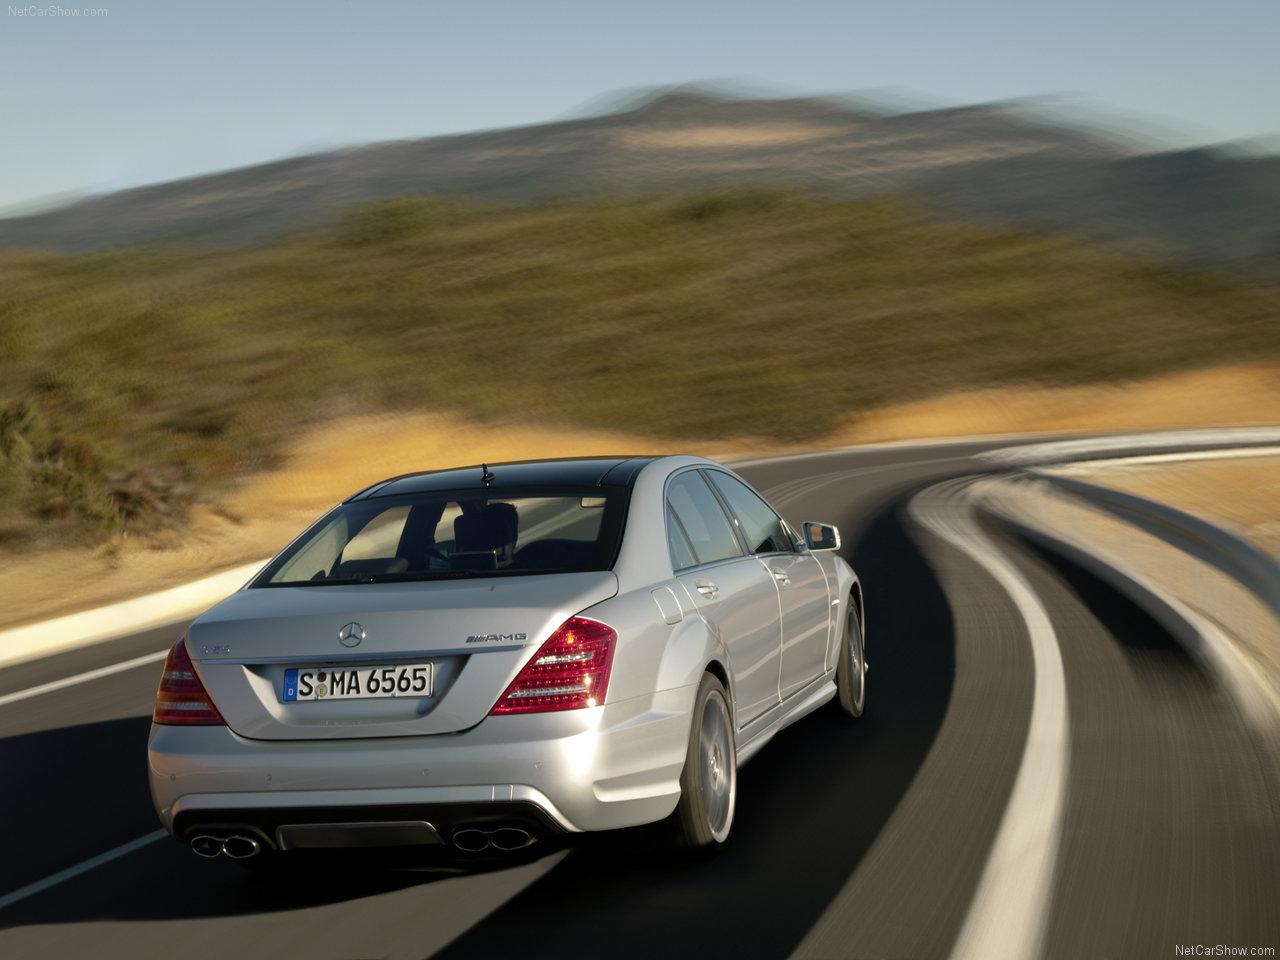 http://3.bp.blogspot.com/_3V1YR3u6VBg/S8RZReArAVI/AAAAAAAAB5c/FCGVAvz9ryQ/s1600/Mercedes-Benz-S65_AMG_2010_1280x960_wallpaper_05.jpg